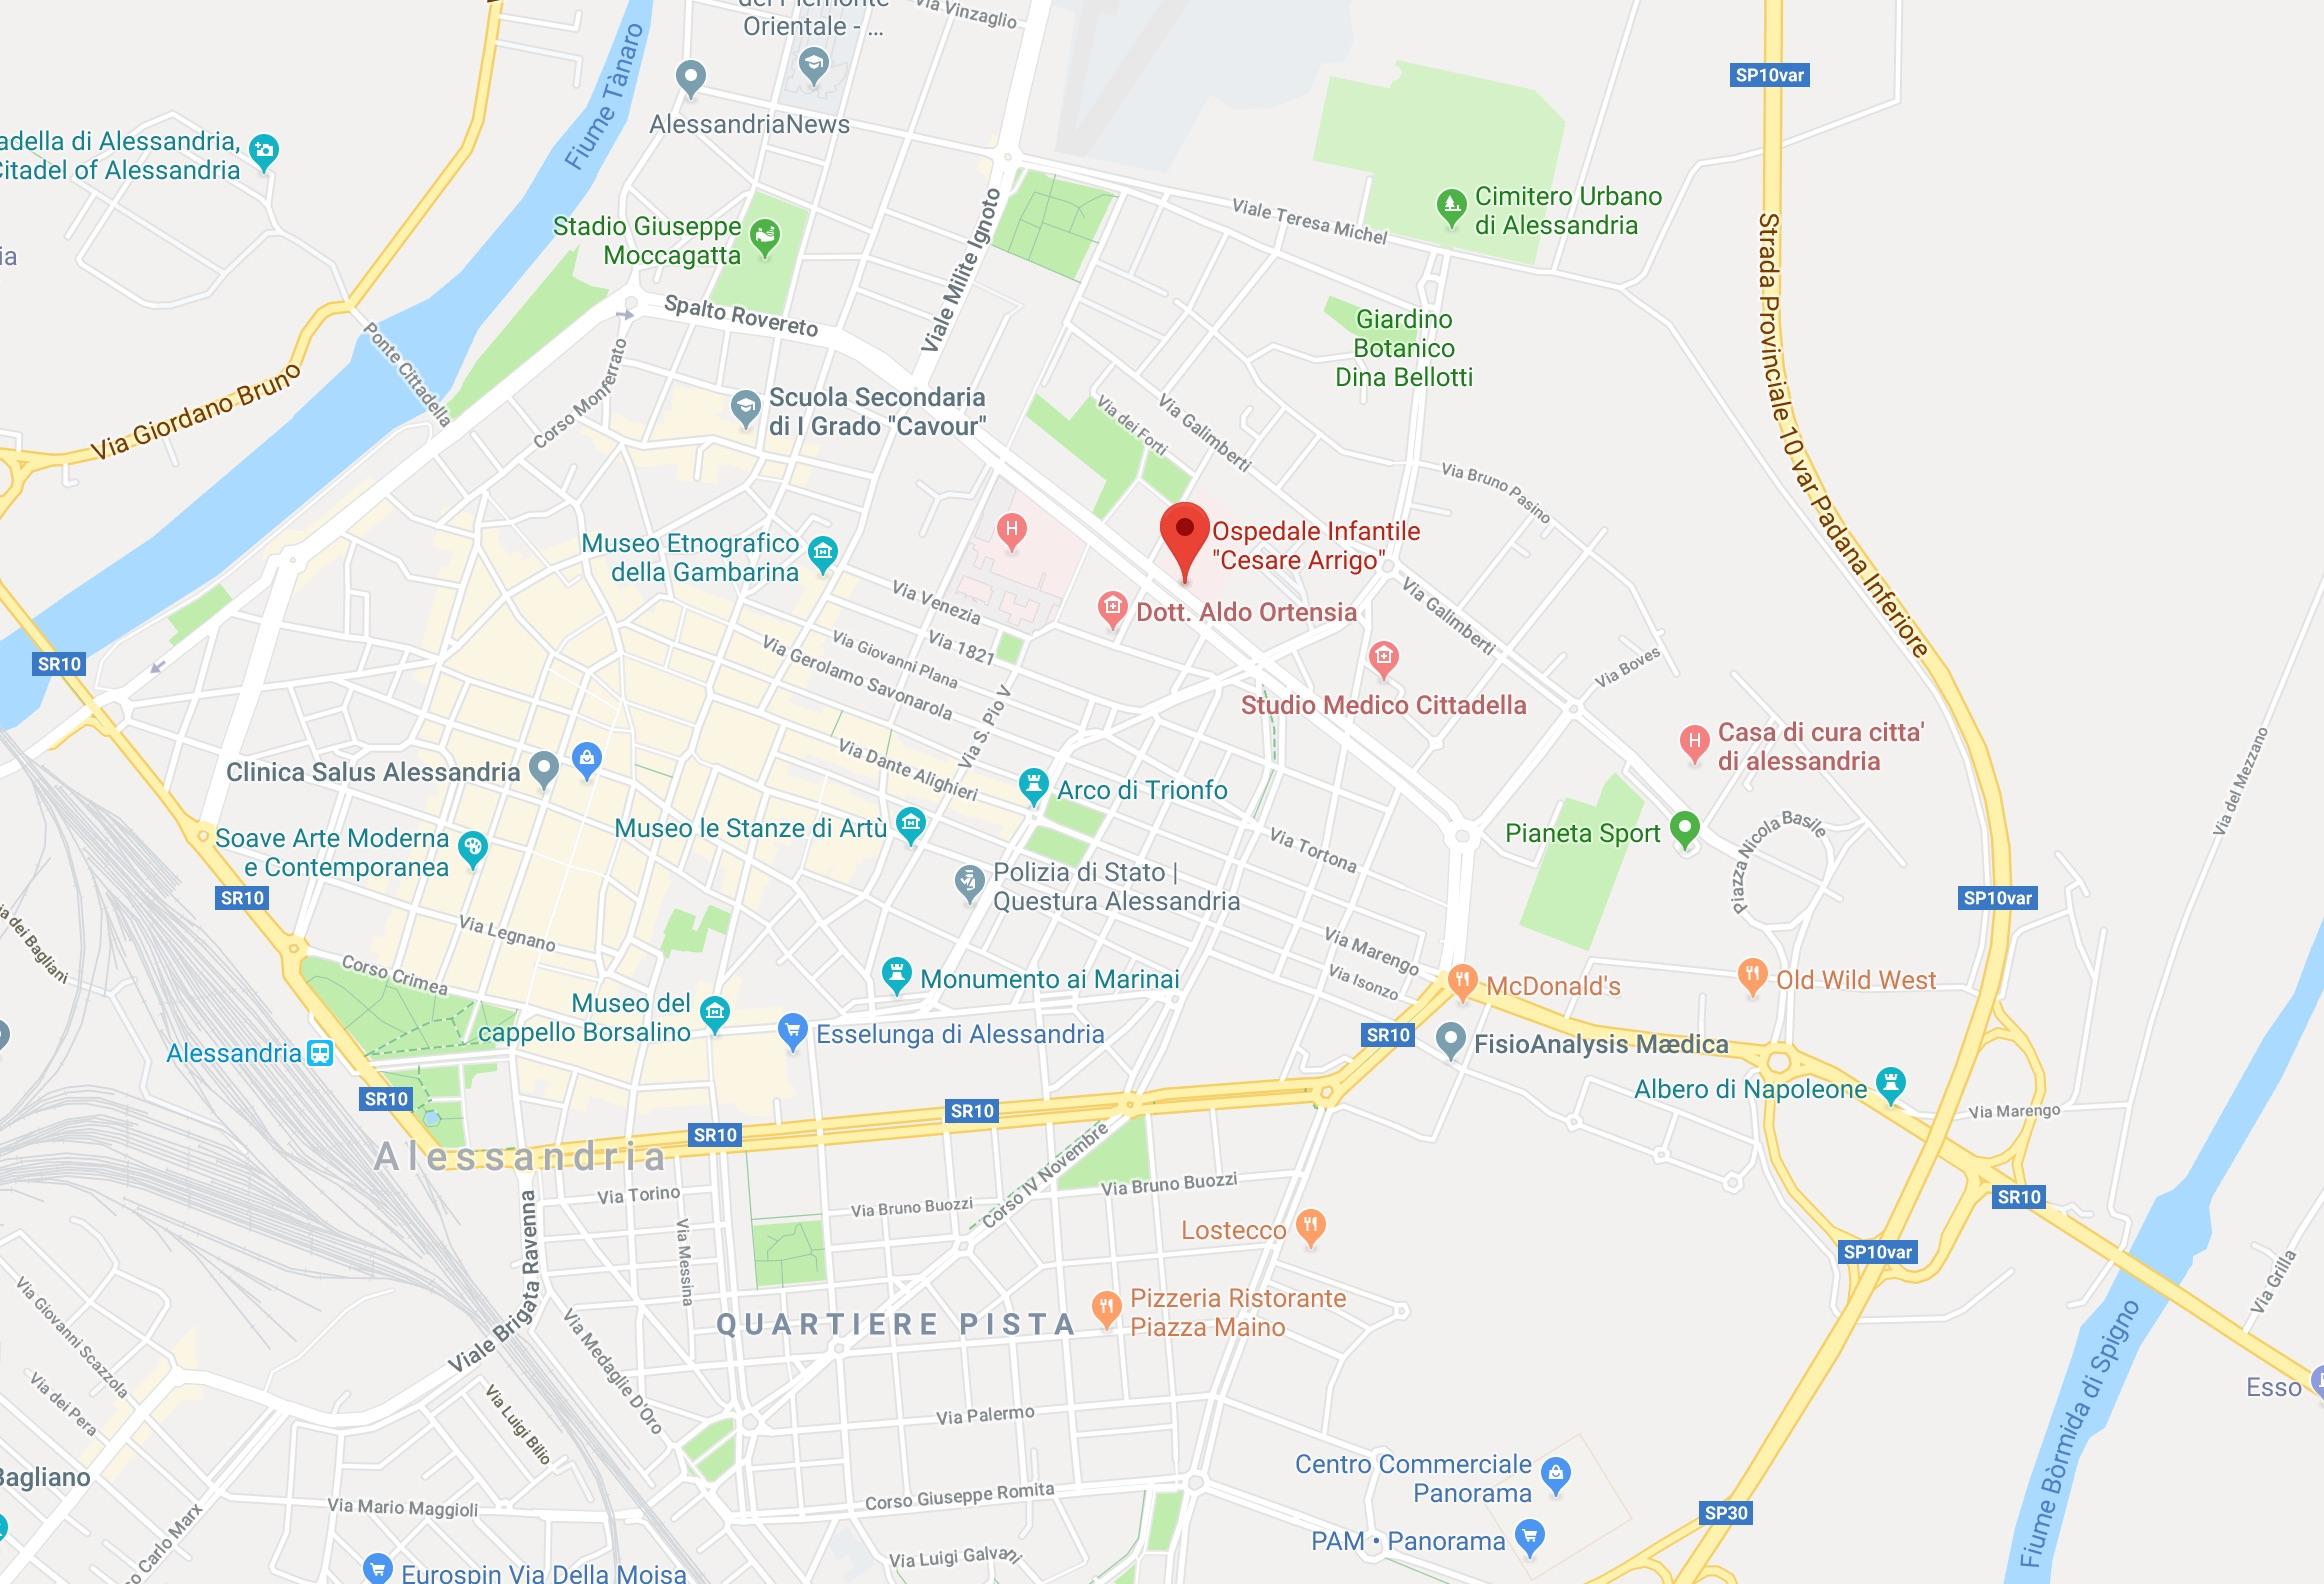 mappa-ospedale-pediatrico-alessandria